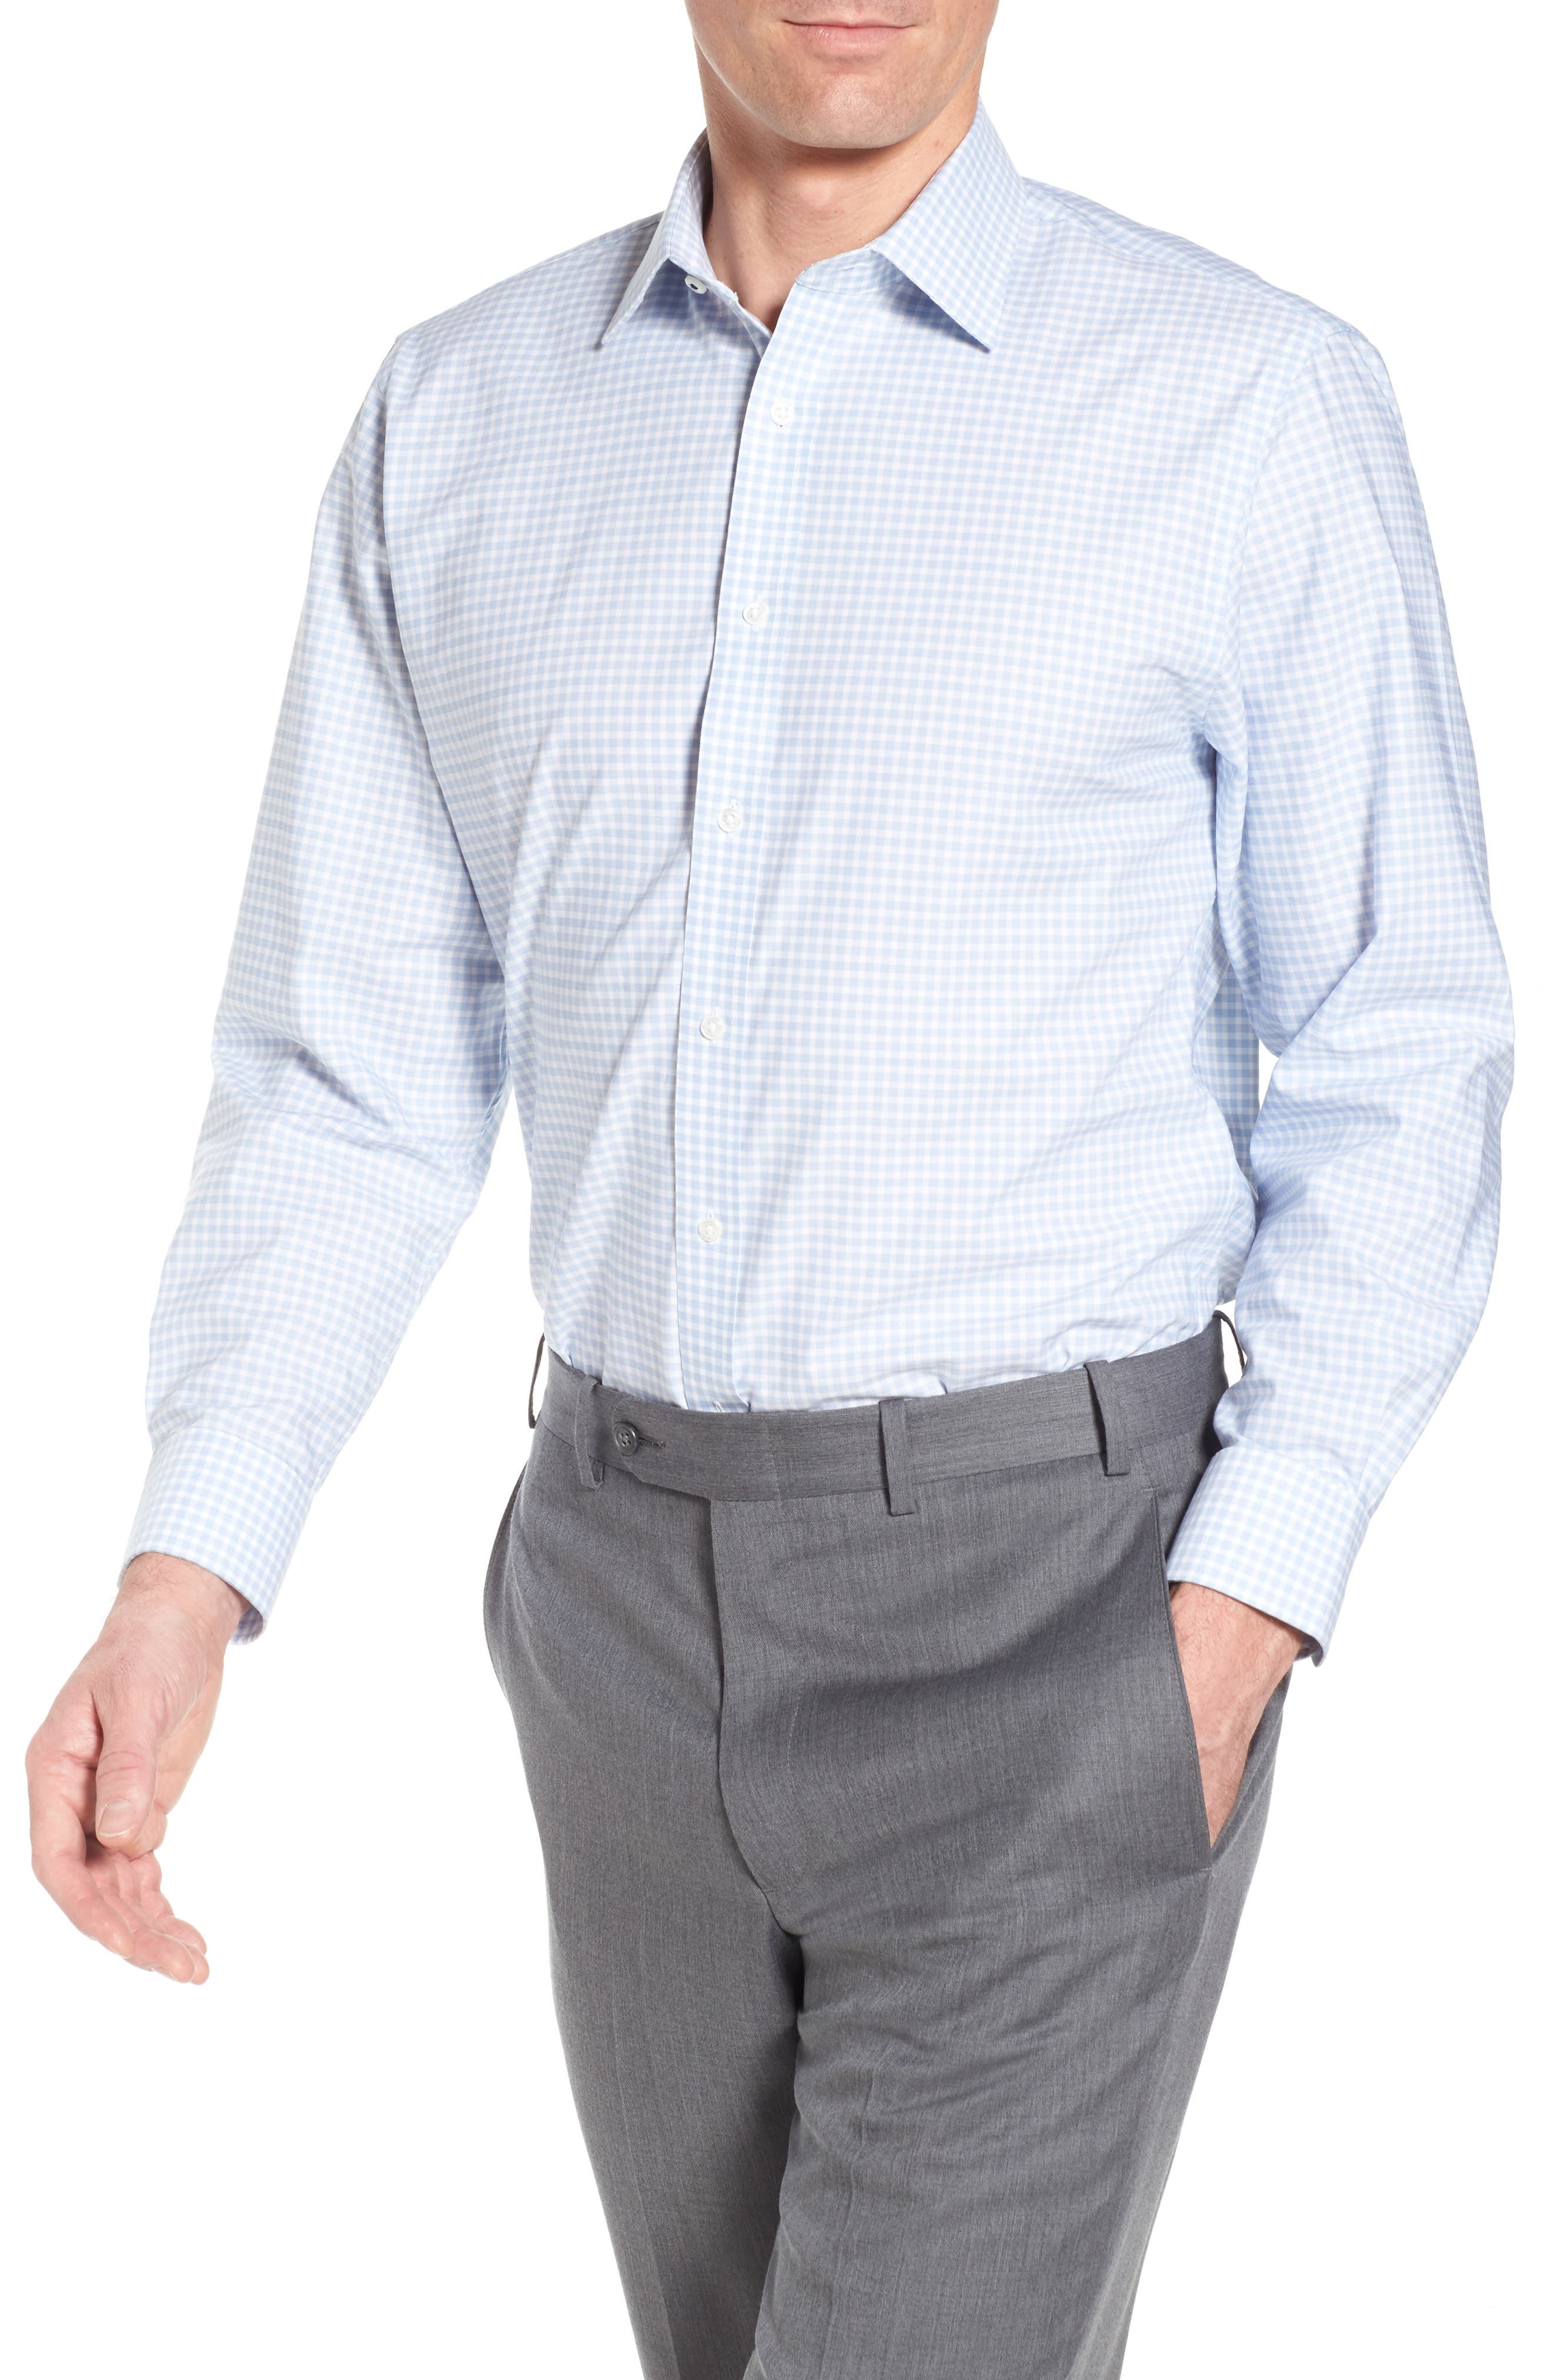 Alternate Image 1 Selected - Nordstrom Men's Shop Tech-Smart Traditional Fit Stretch Check Dress Shirt